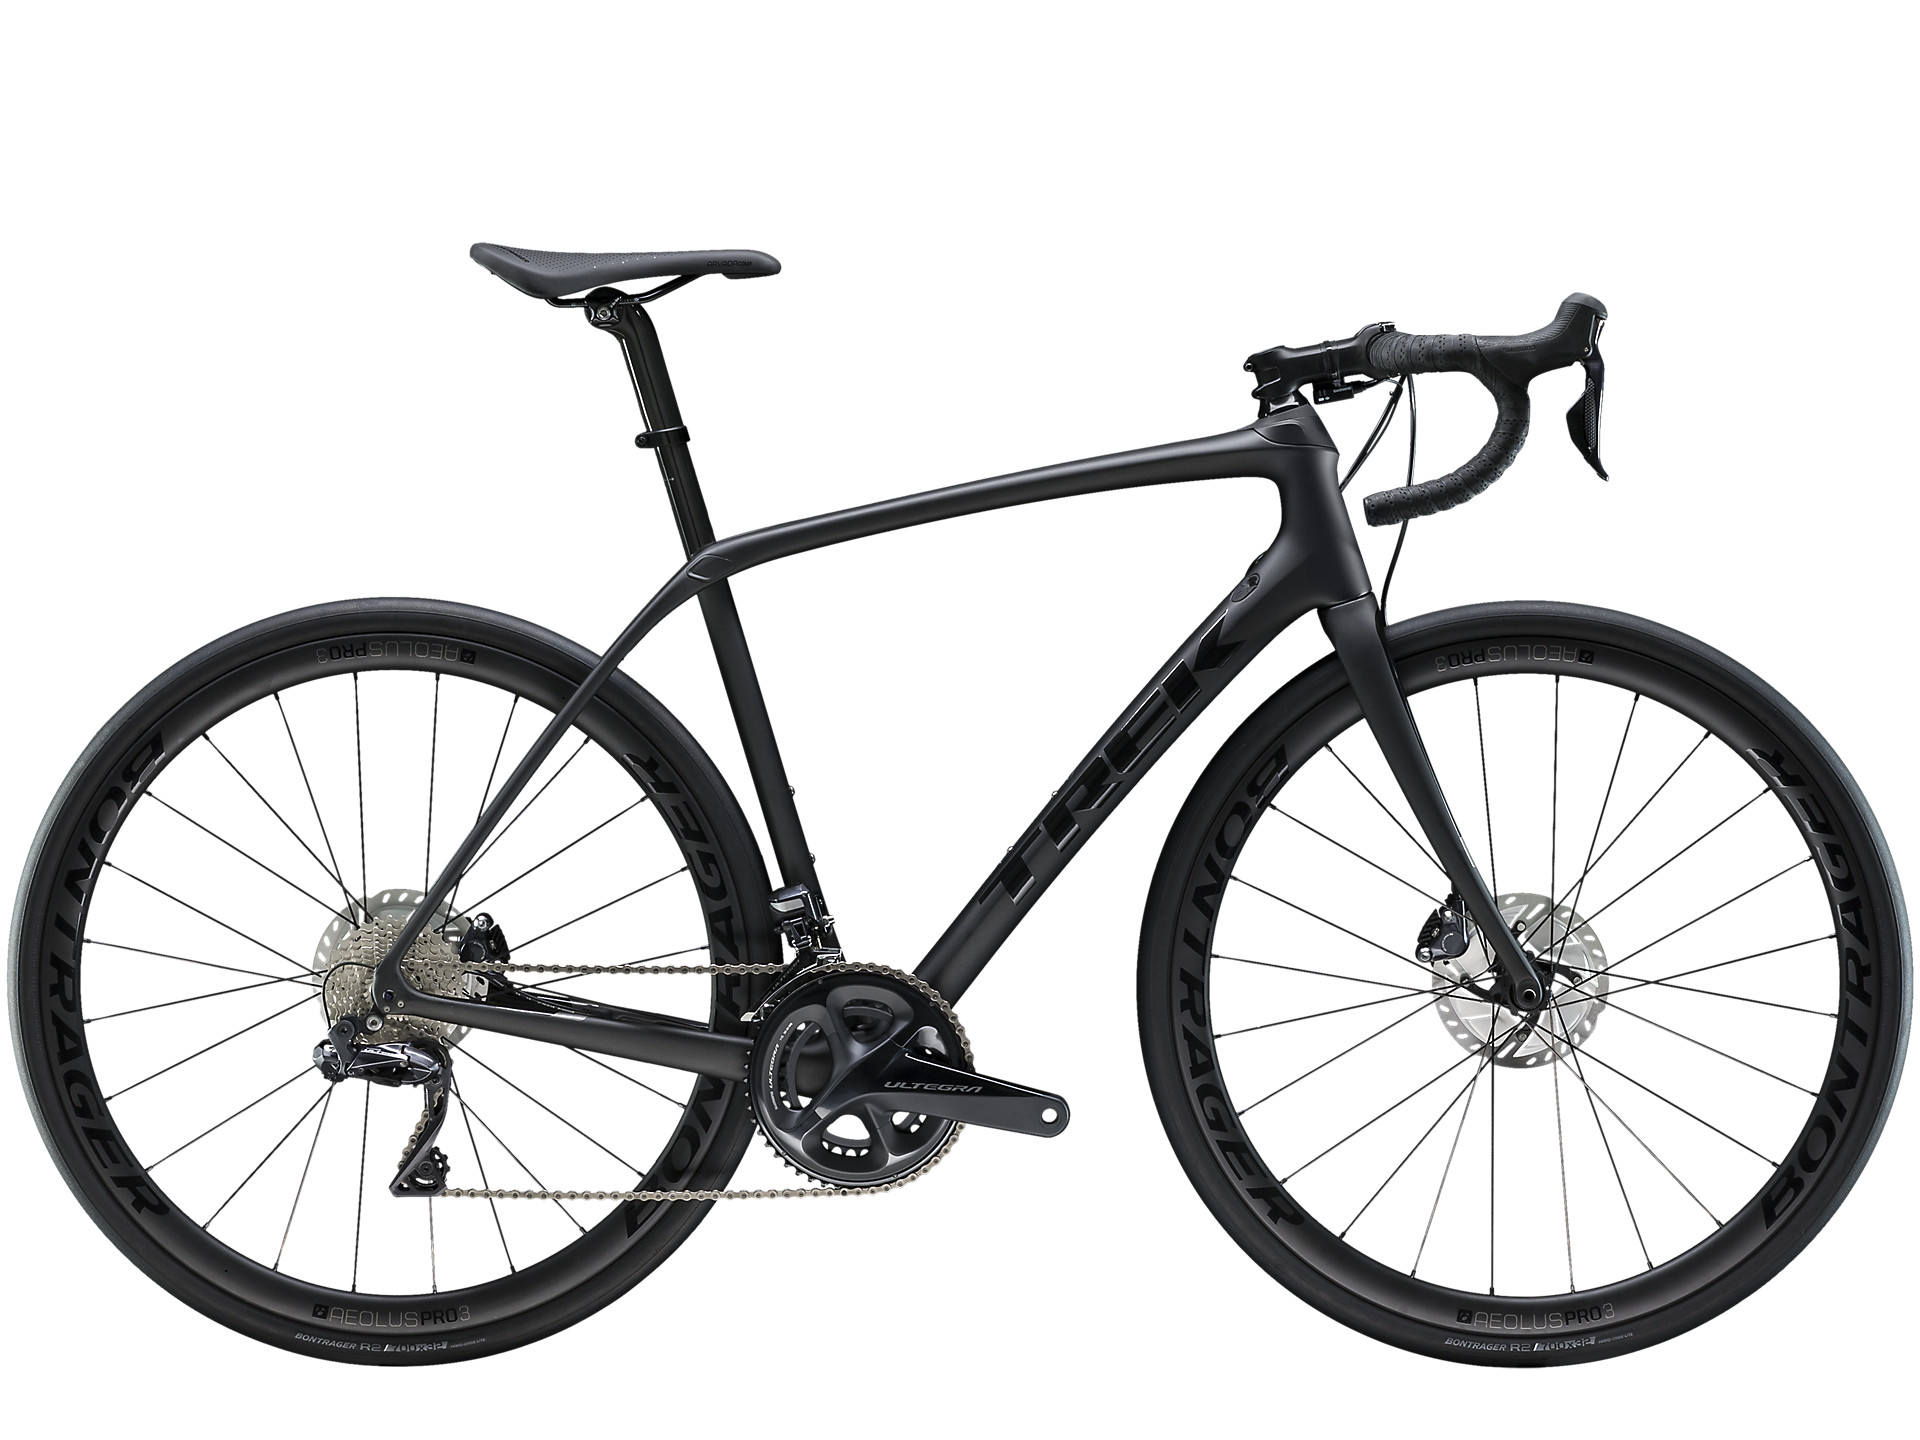 37525ebb7a0 Domane SL 5 Women's | Trek Bikes